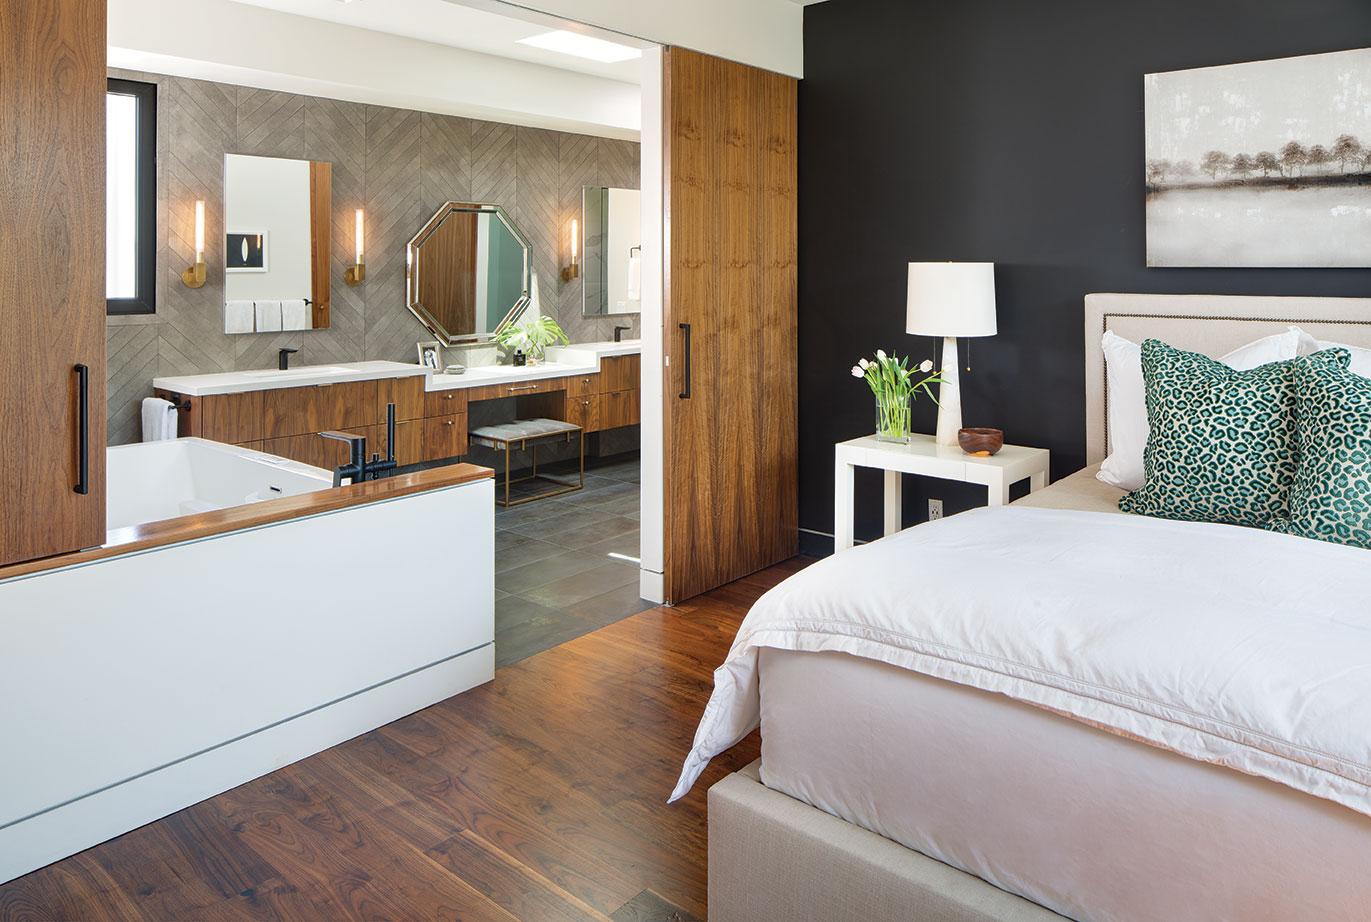 modern family home master bedroom bathroom black paint walls walnut trim soaking tub